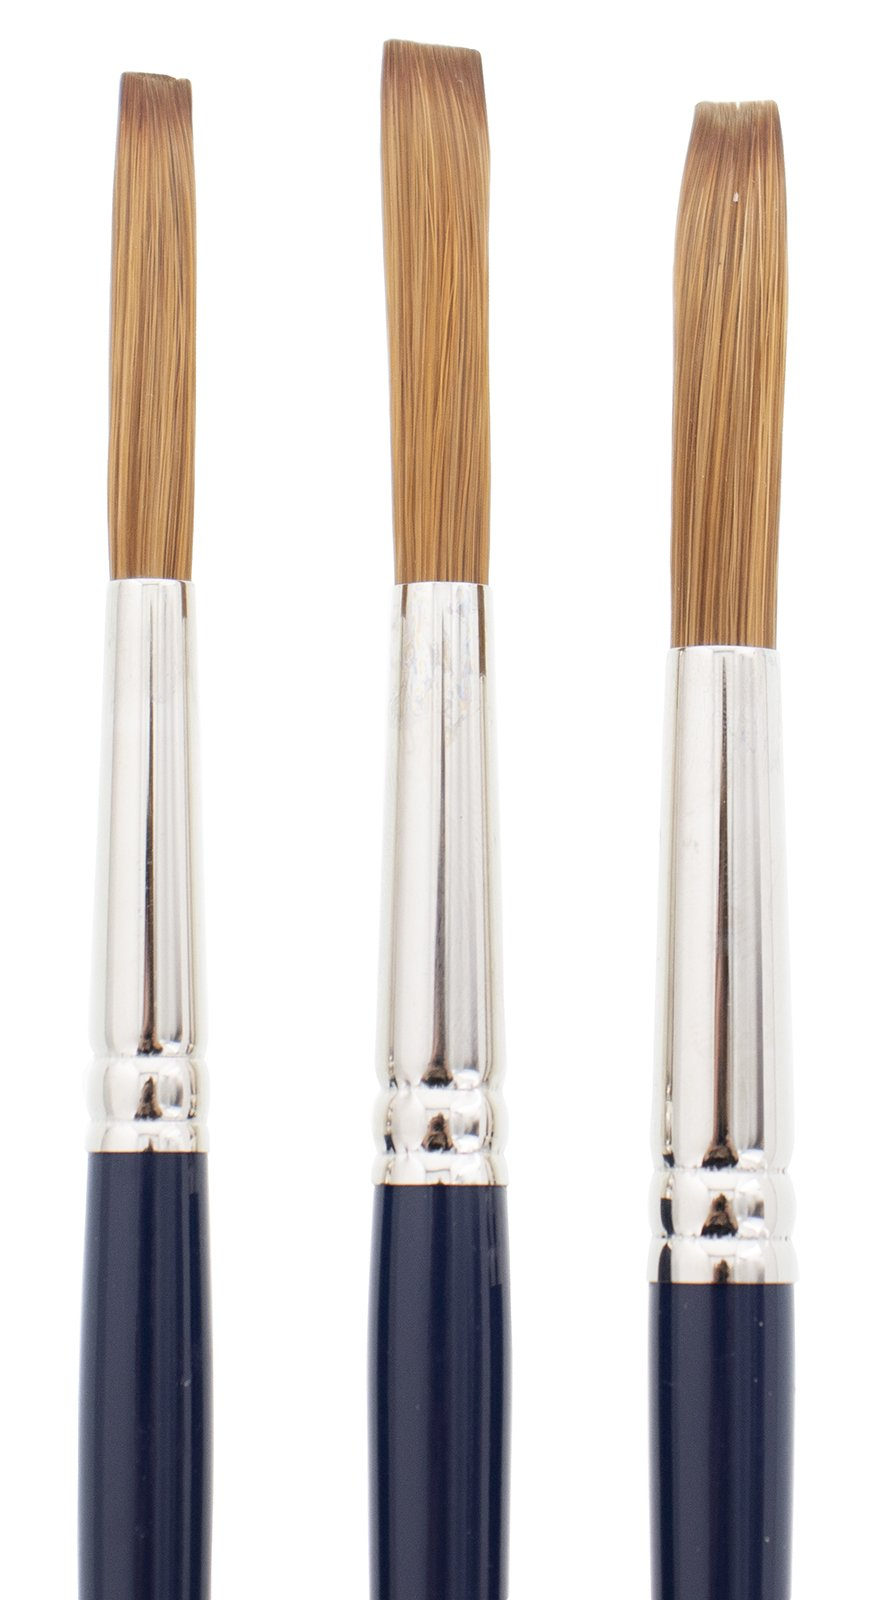 Andrew Mack Brush AM1961-12-16 Series 1961 Mack & Meyer Mop Pinstriping Brushes Sizes 12-16 by Andrew Mack Brush (Image #2)